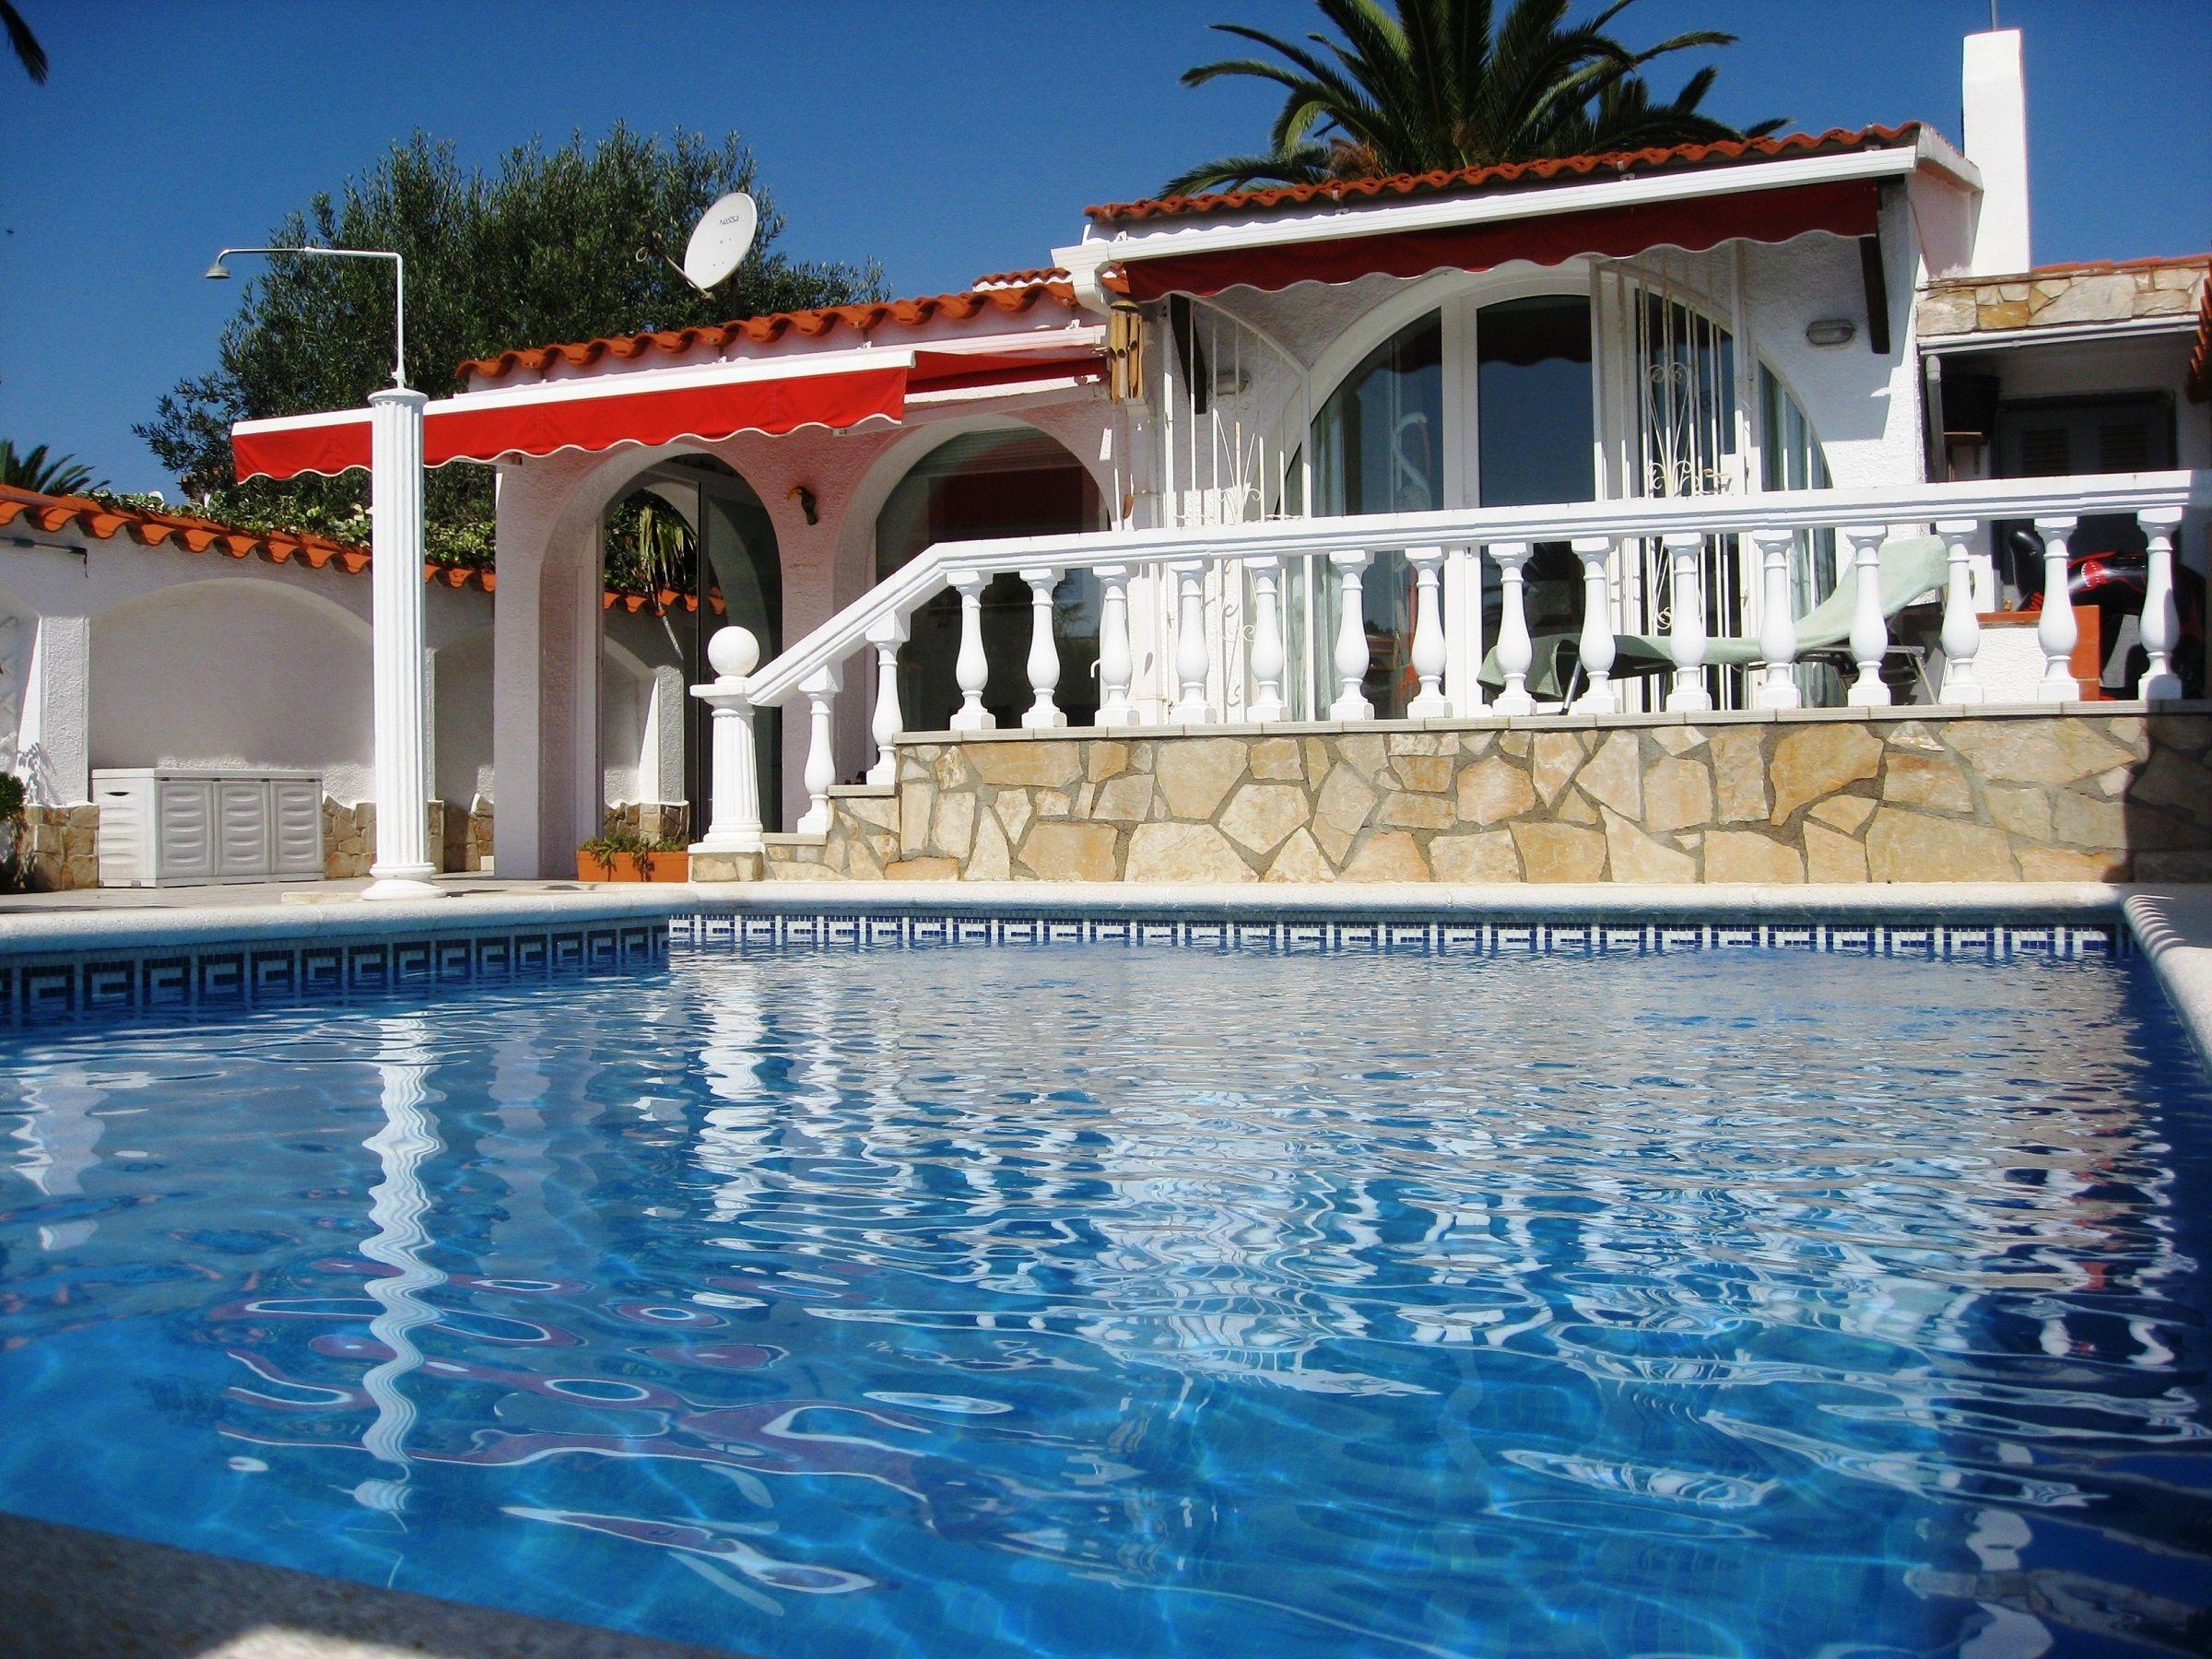 Casa Marisol Ampuriabrava Casa Marisol mit Pool 120qm 2 Schlafzimmer max 7 Personen